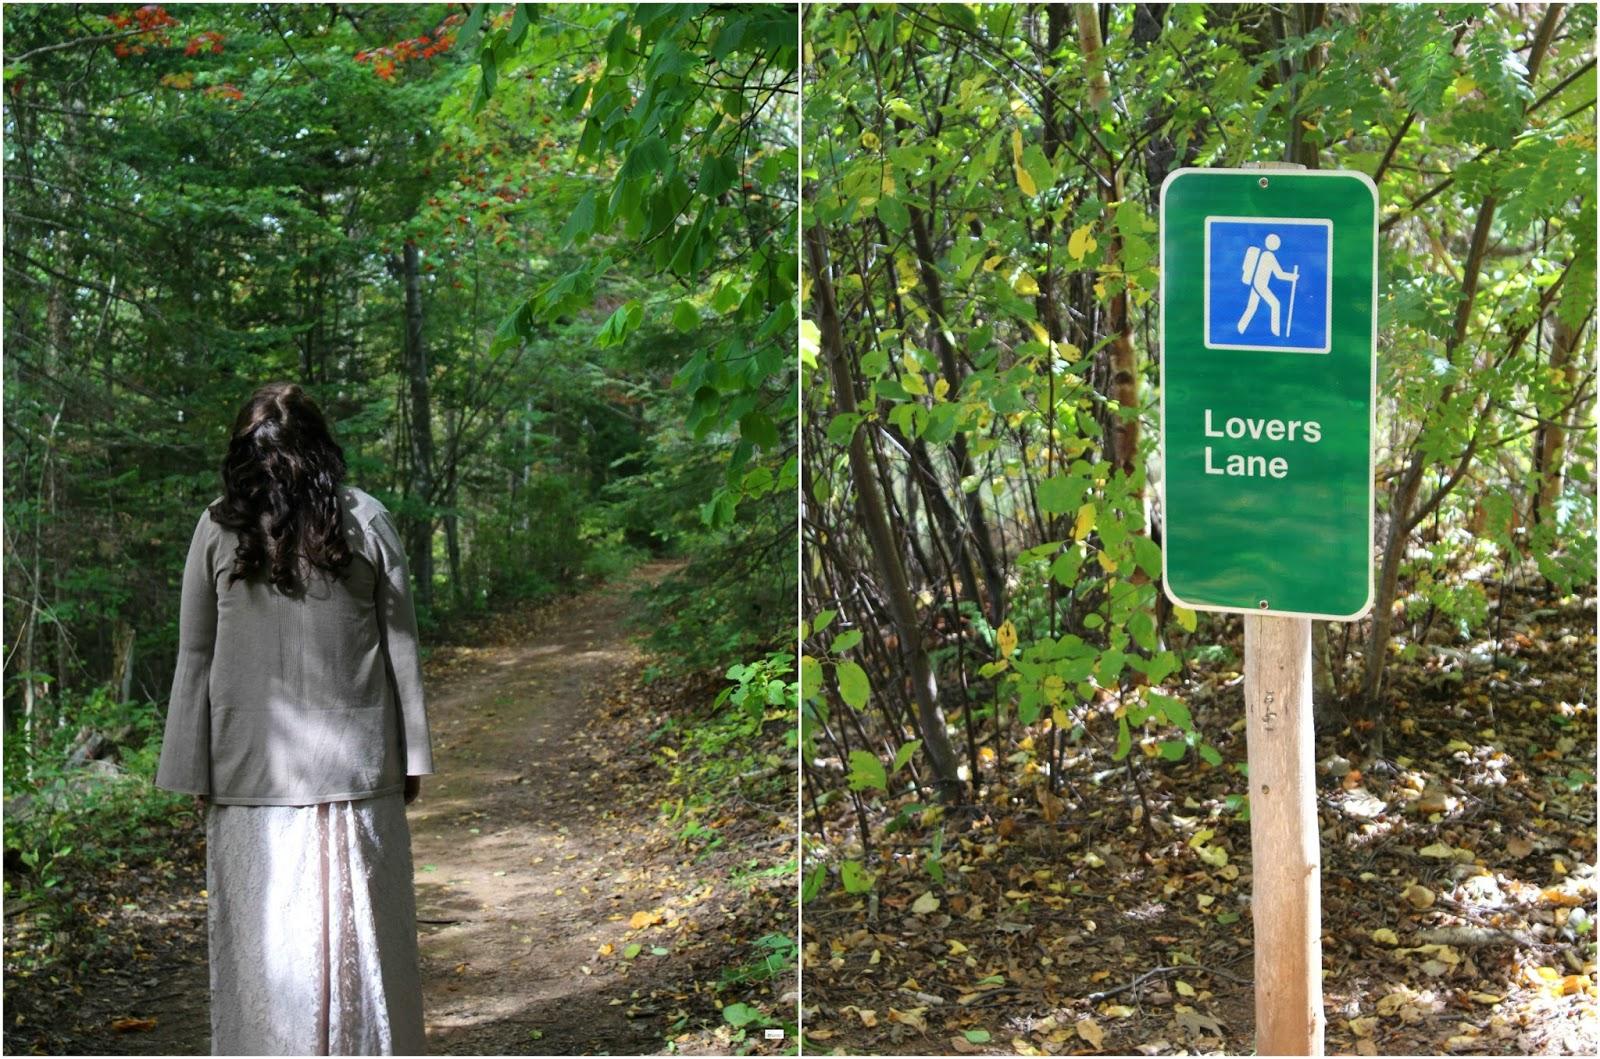 Lovers lane trails